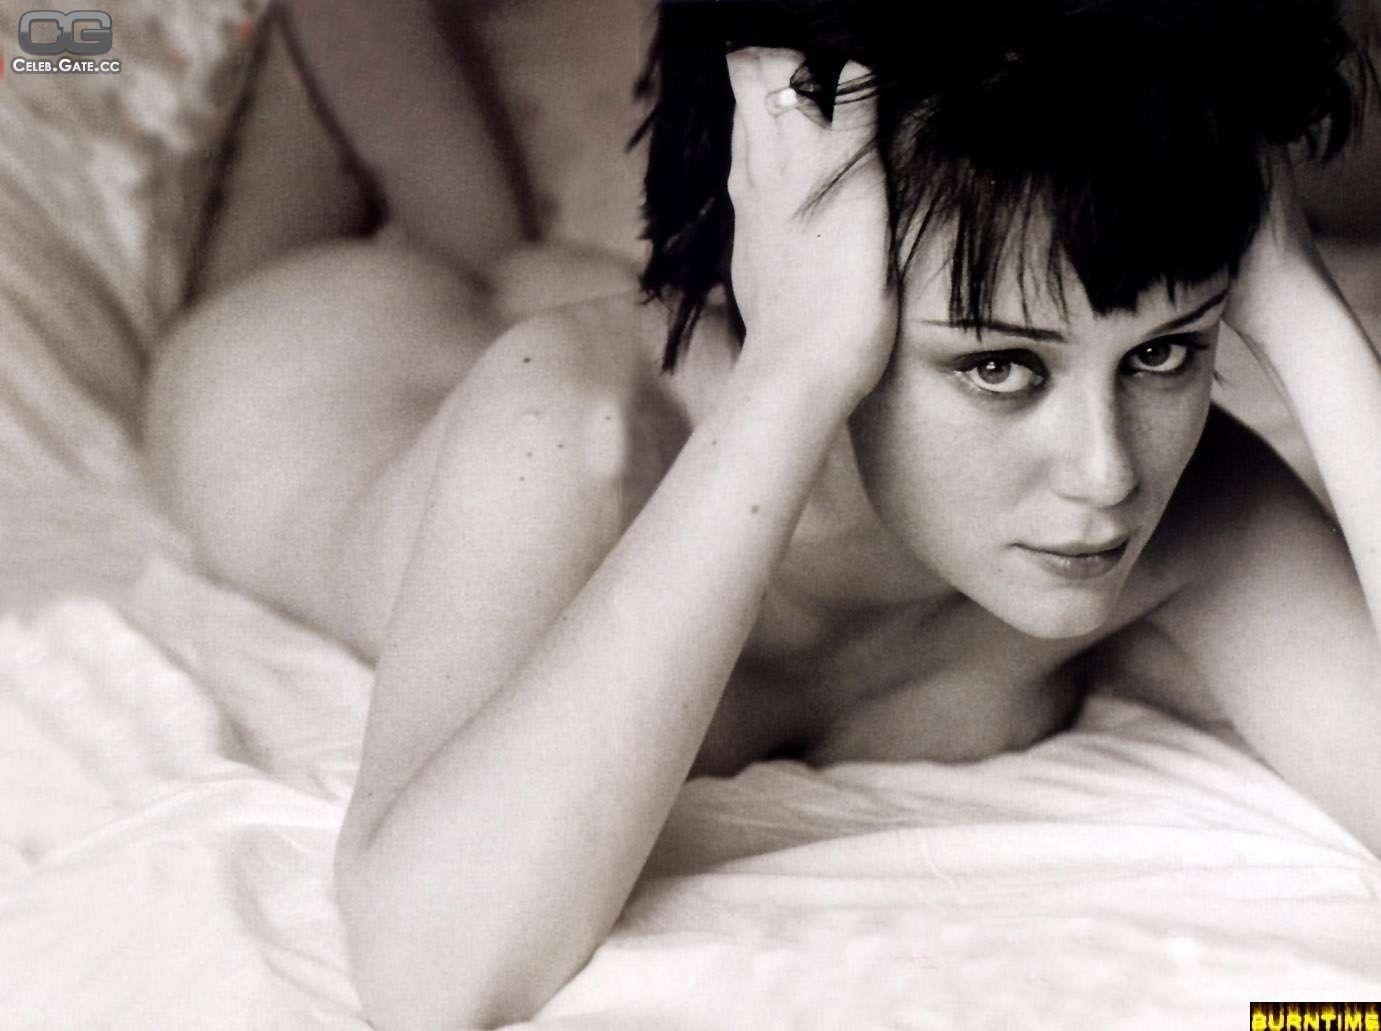 Keely Hawes Topless Good keeley hawes tits - google search | keeley hawes | pinterest